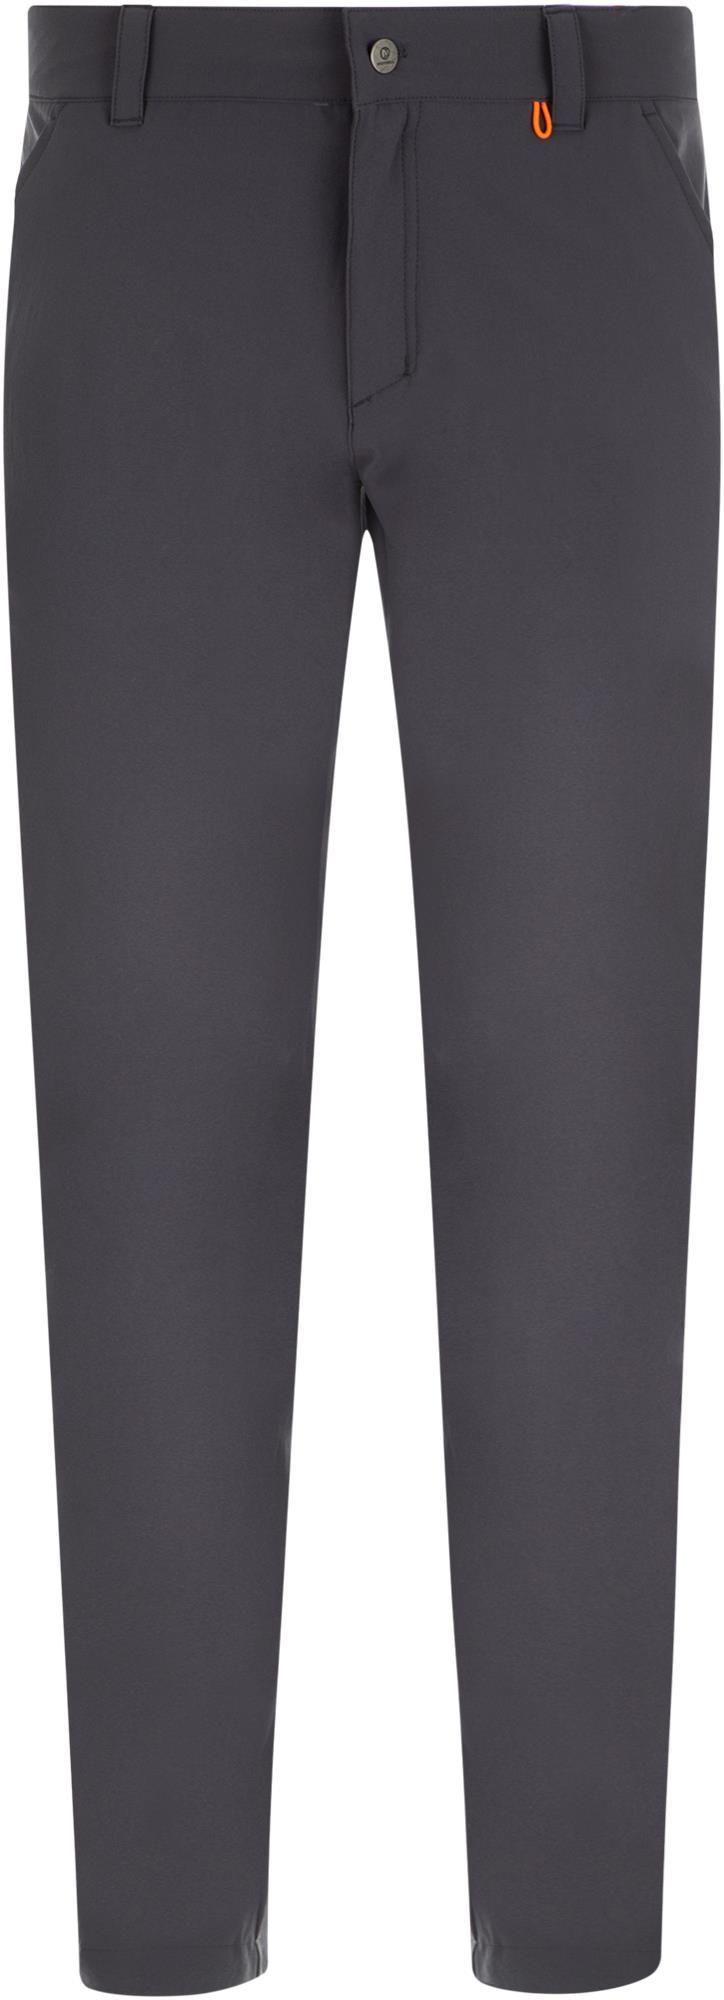 Брюки Merrell Men's Pants брюки мужские merrell men s pants цвет темно синий s19amrpam04 z4 размер 46 32